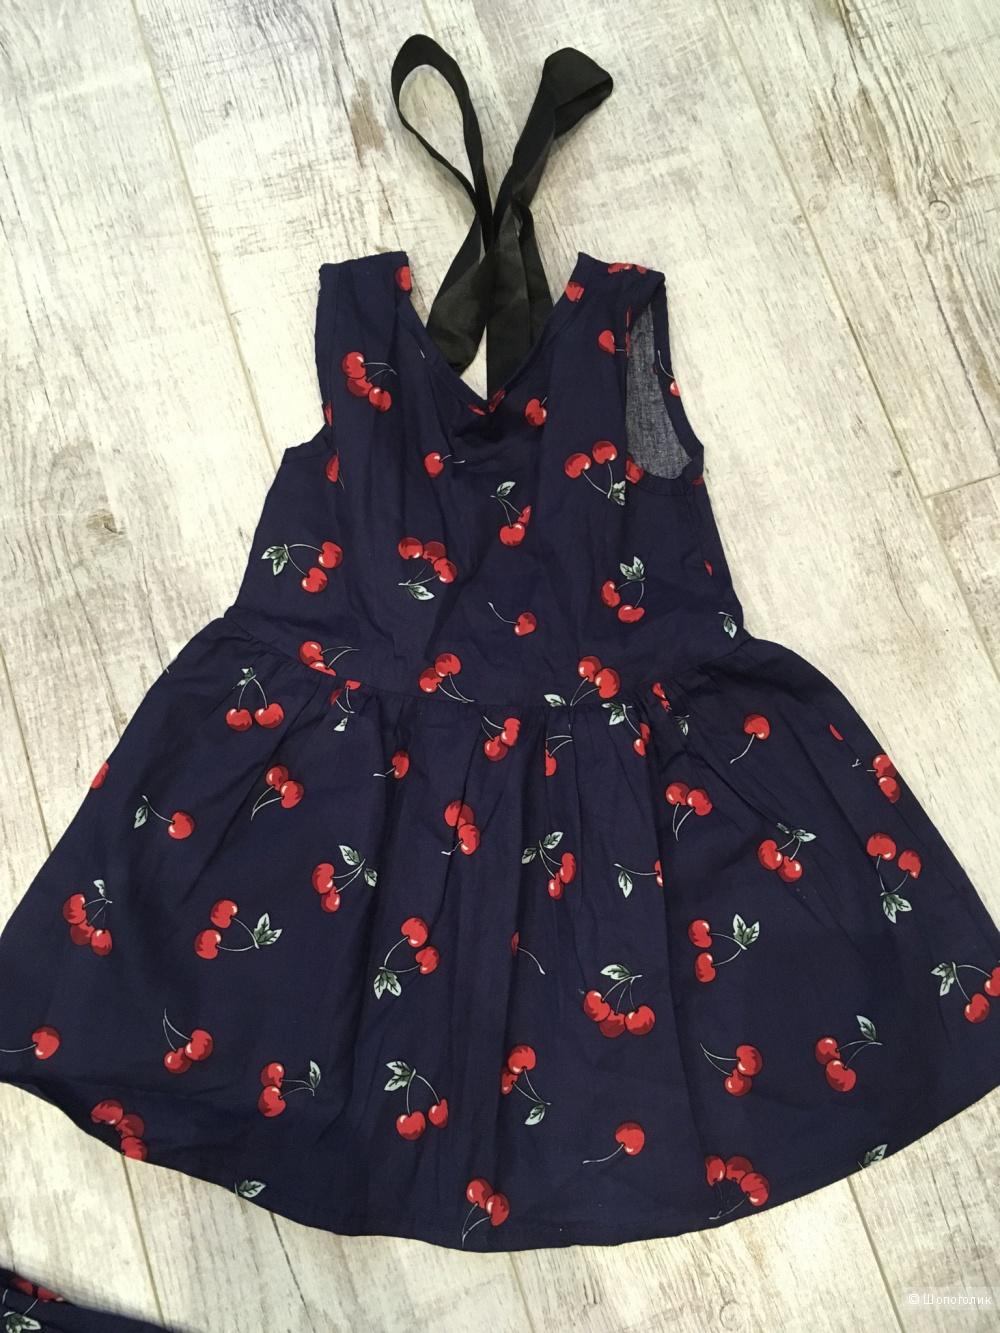 Комплект платьев мама и дочка (family look),  42-44, детский 90